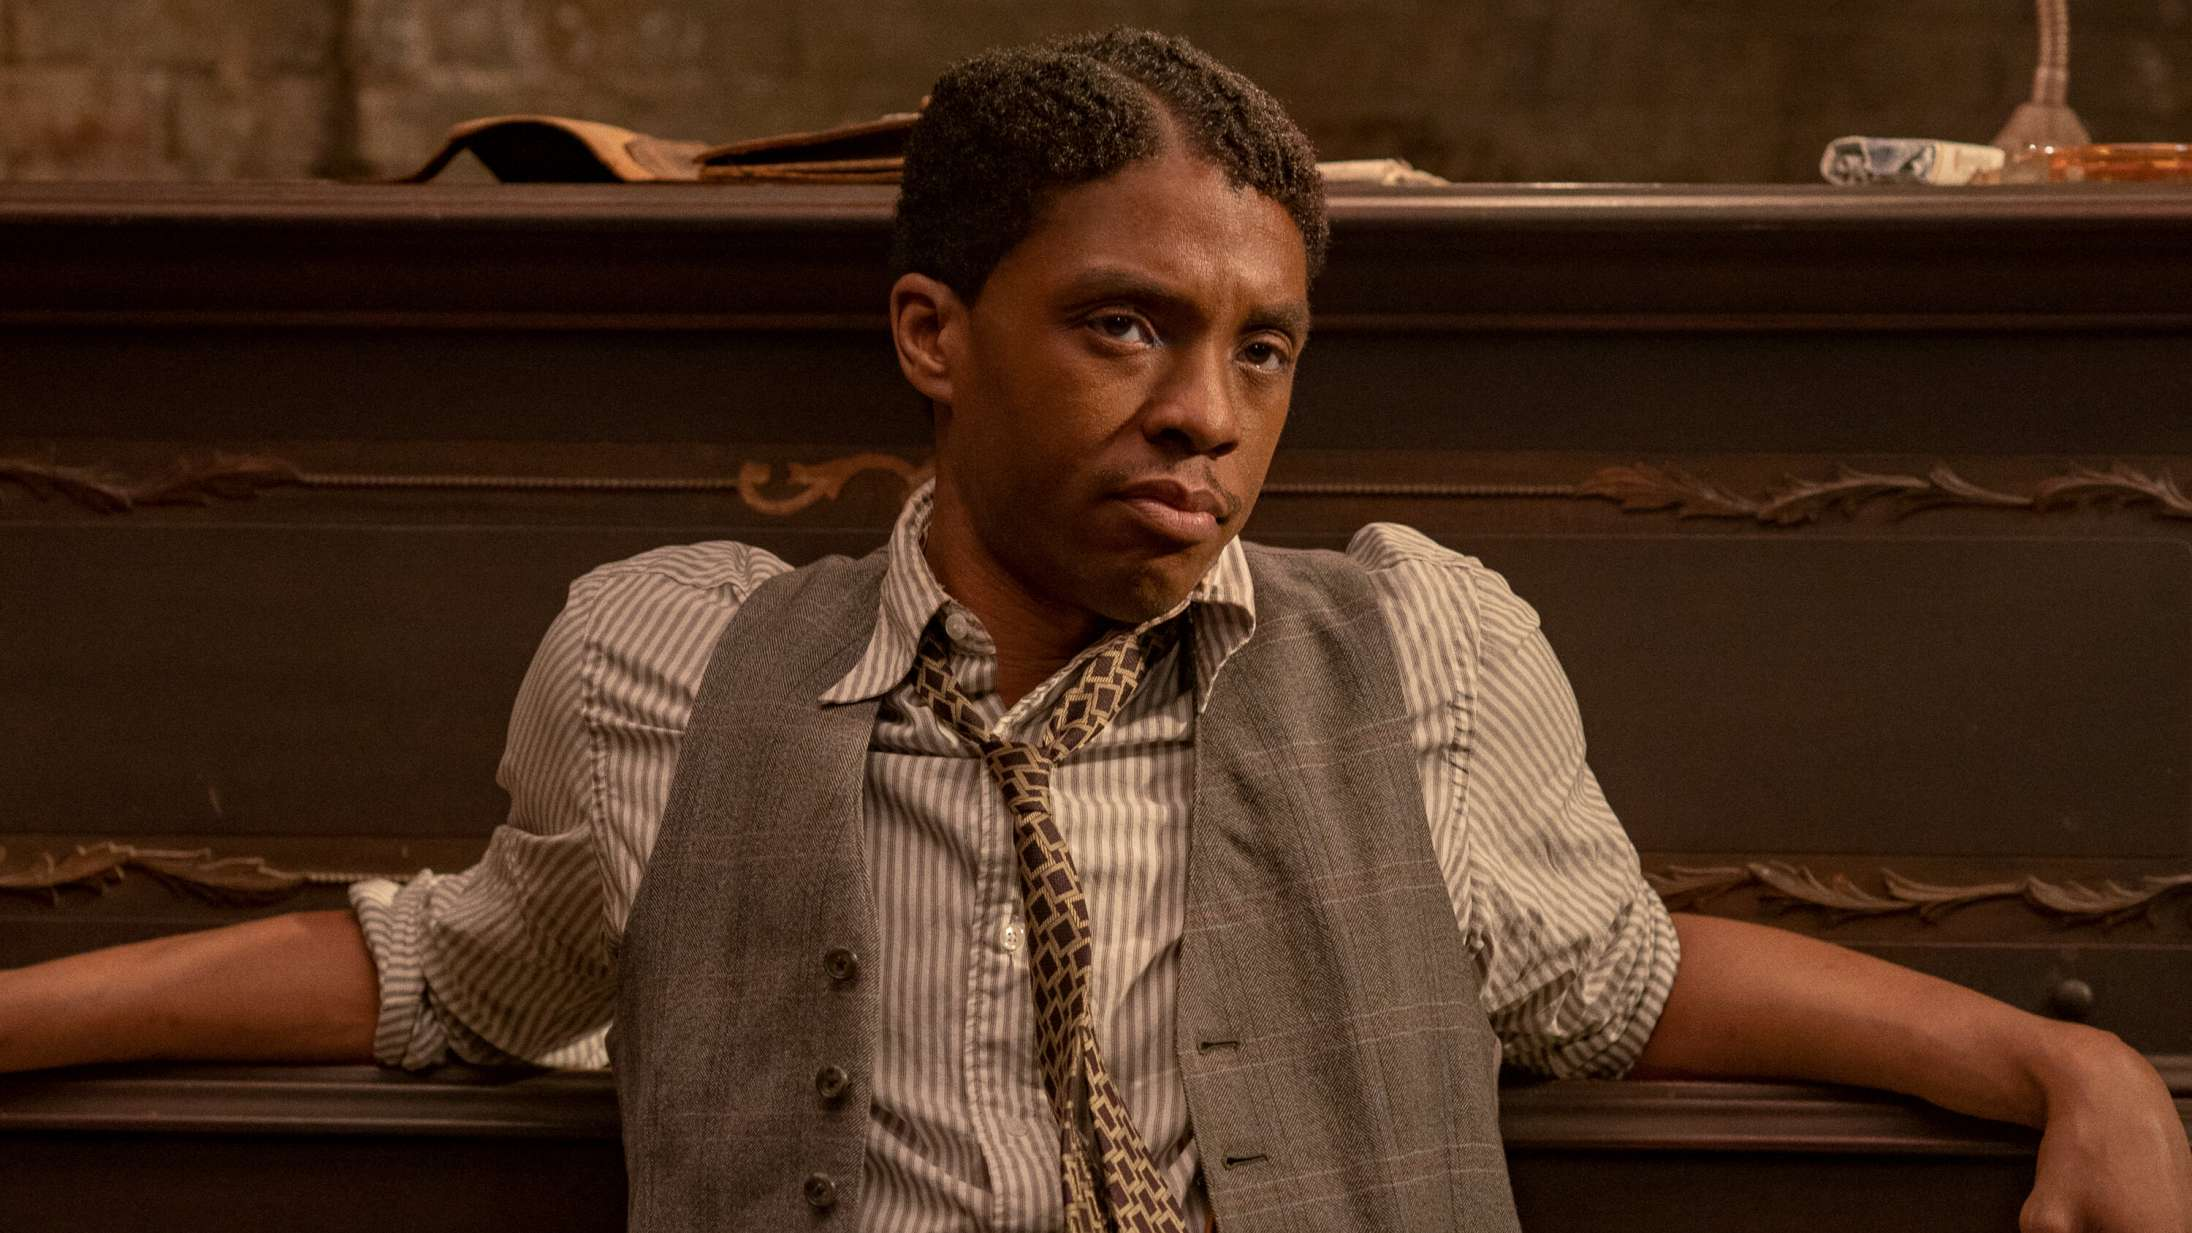 Ny Netflix-dokumentar om Chadwick Boseman er tilgængelig i 30 dage – se traileren